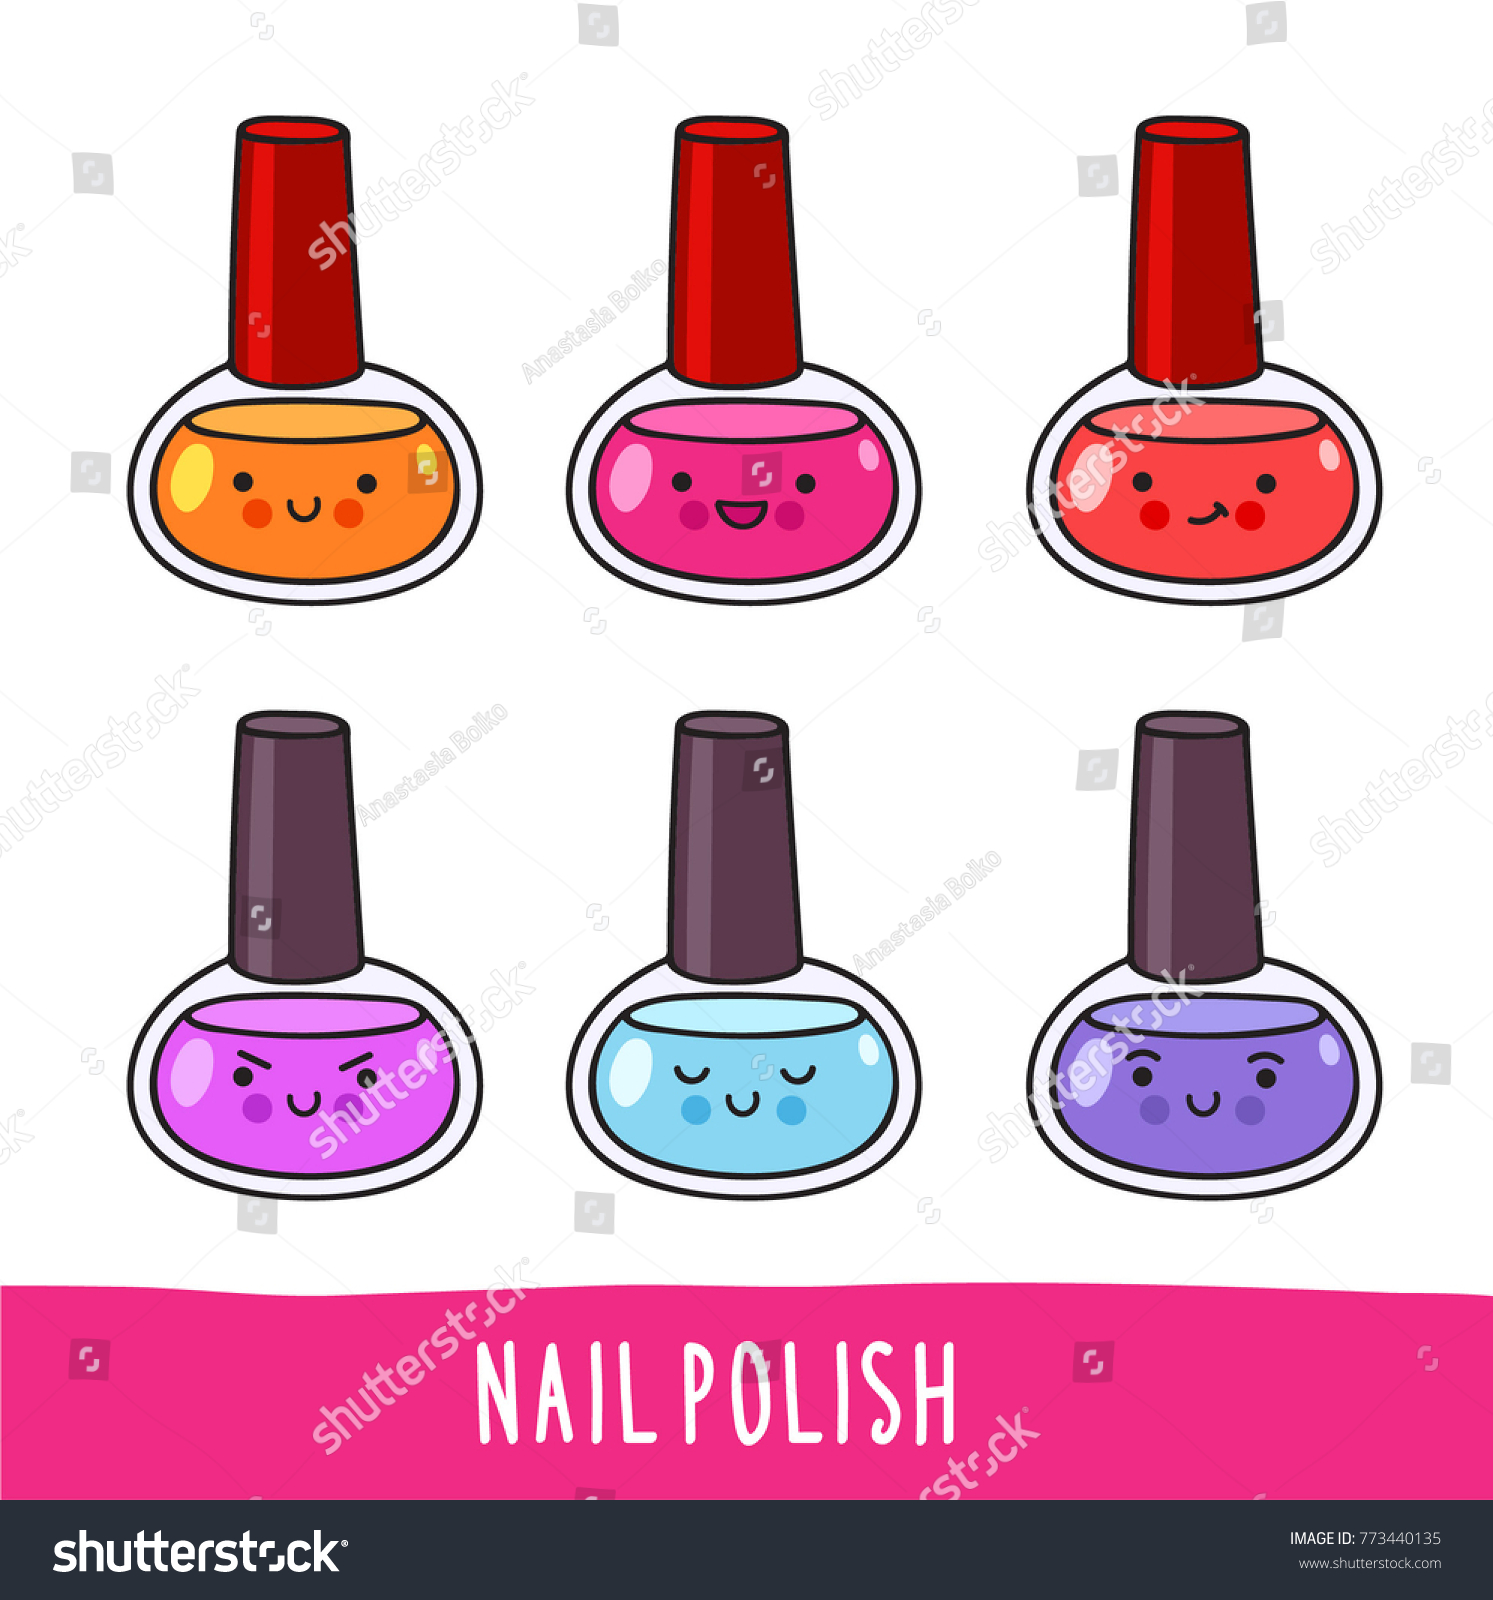 Nail Polish Set Cute Cartoon Doodle Stock Vector (Royalty Free ...